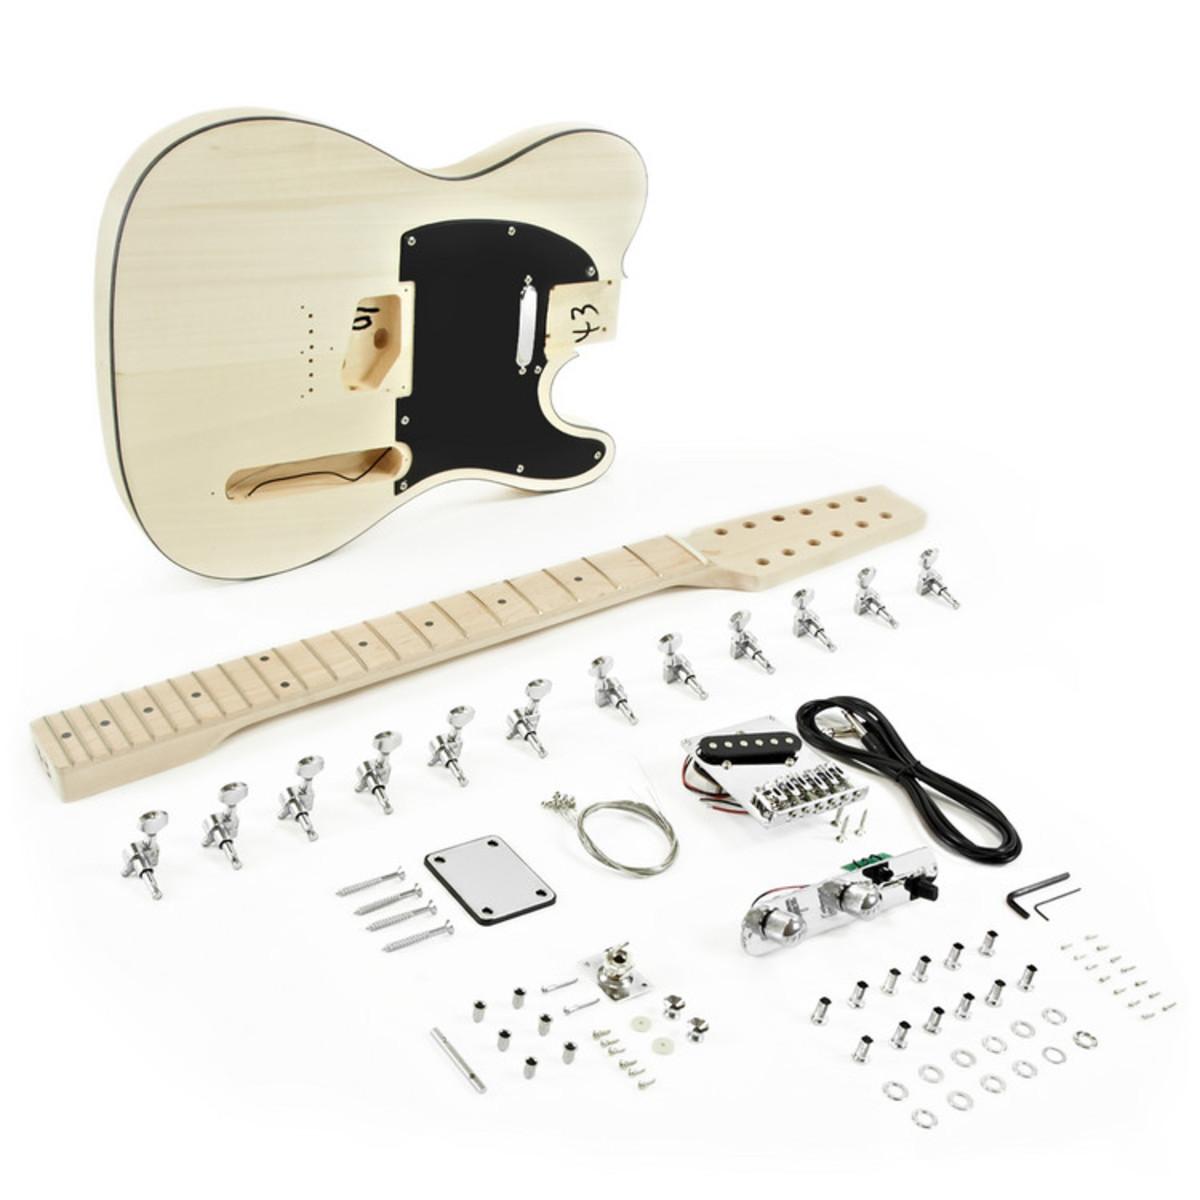 Image of 12 String Knoxville Electric Guitar DIY Kit